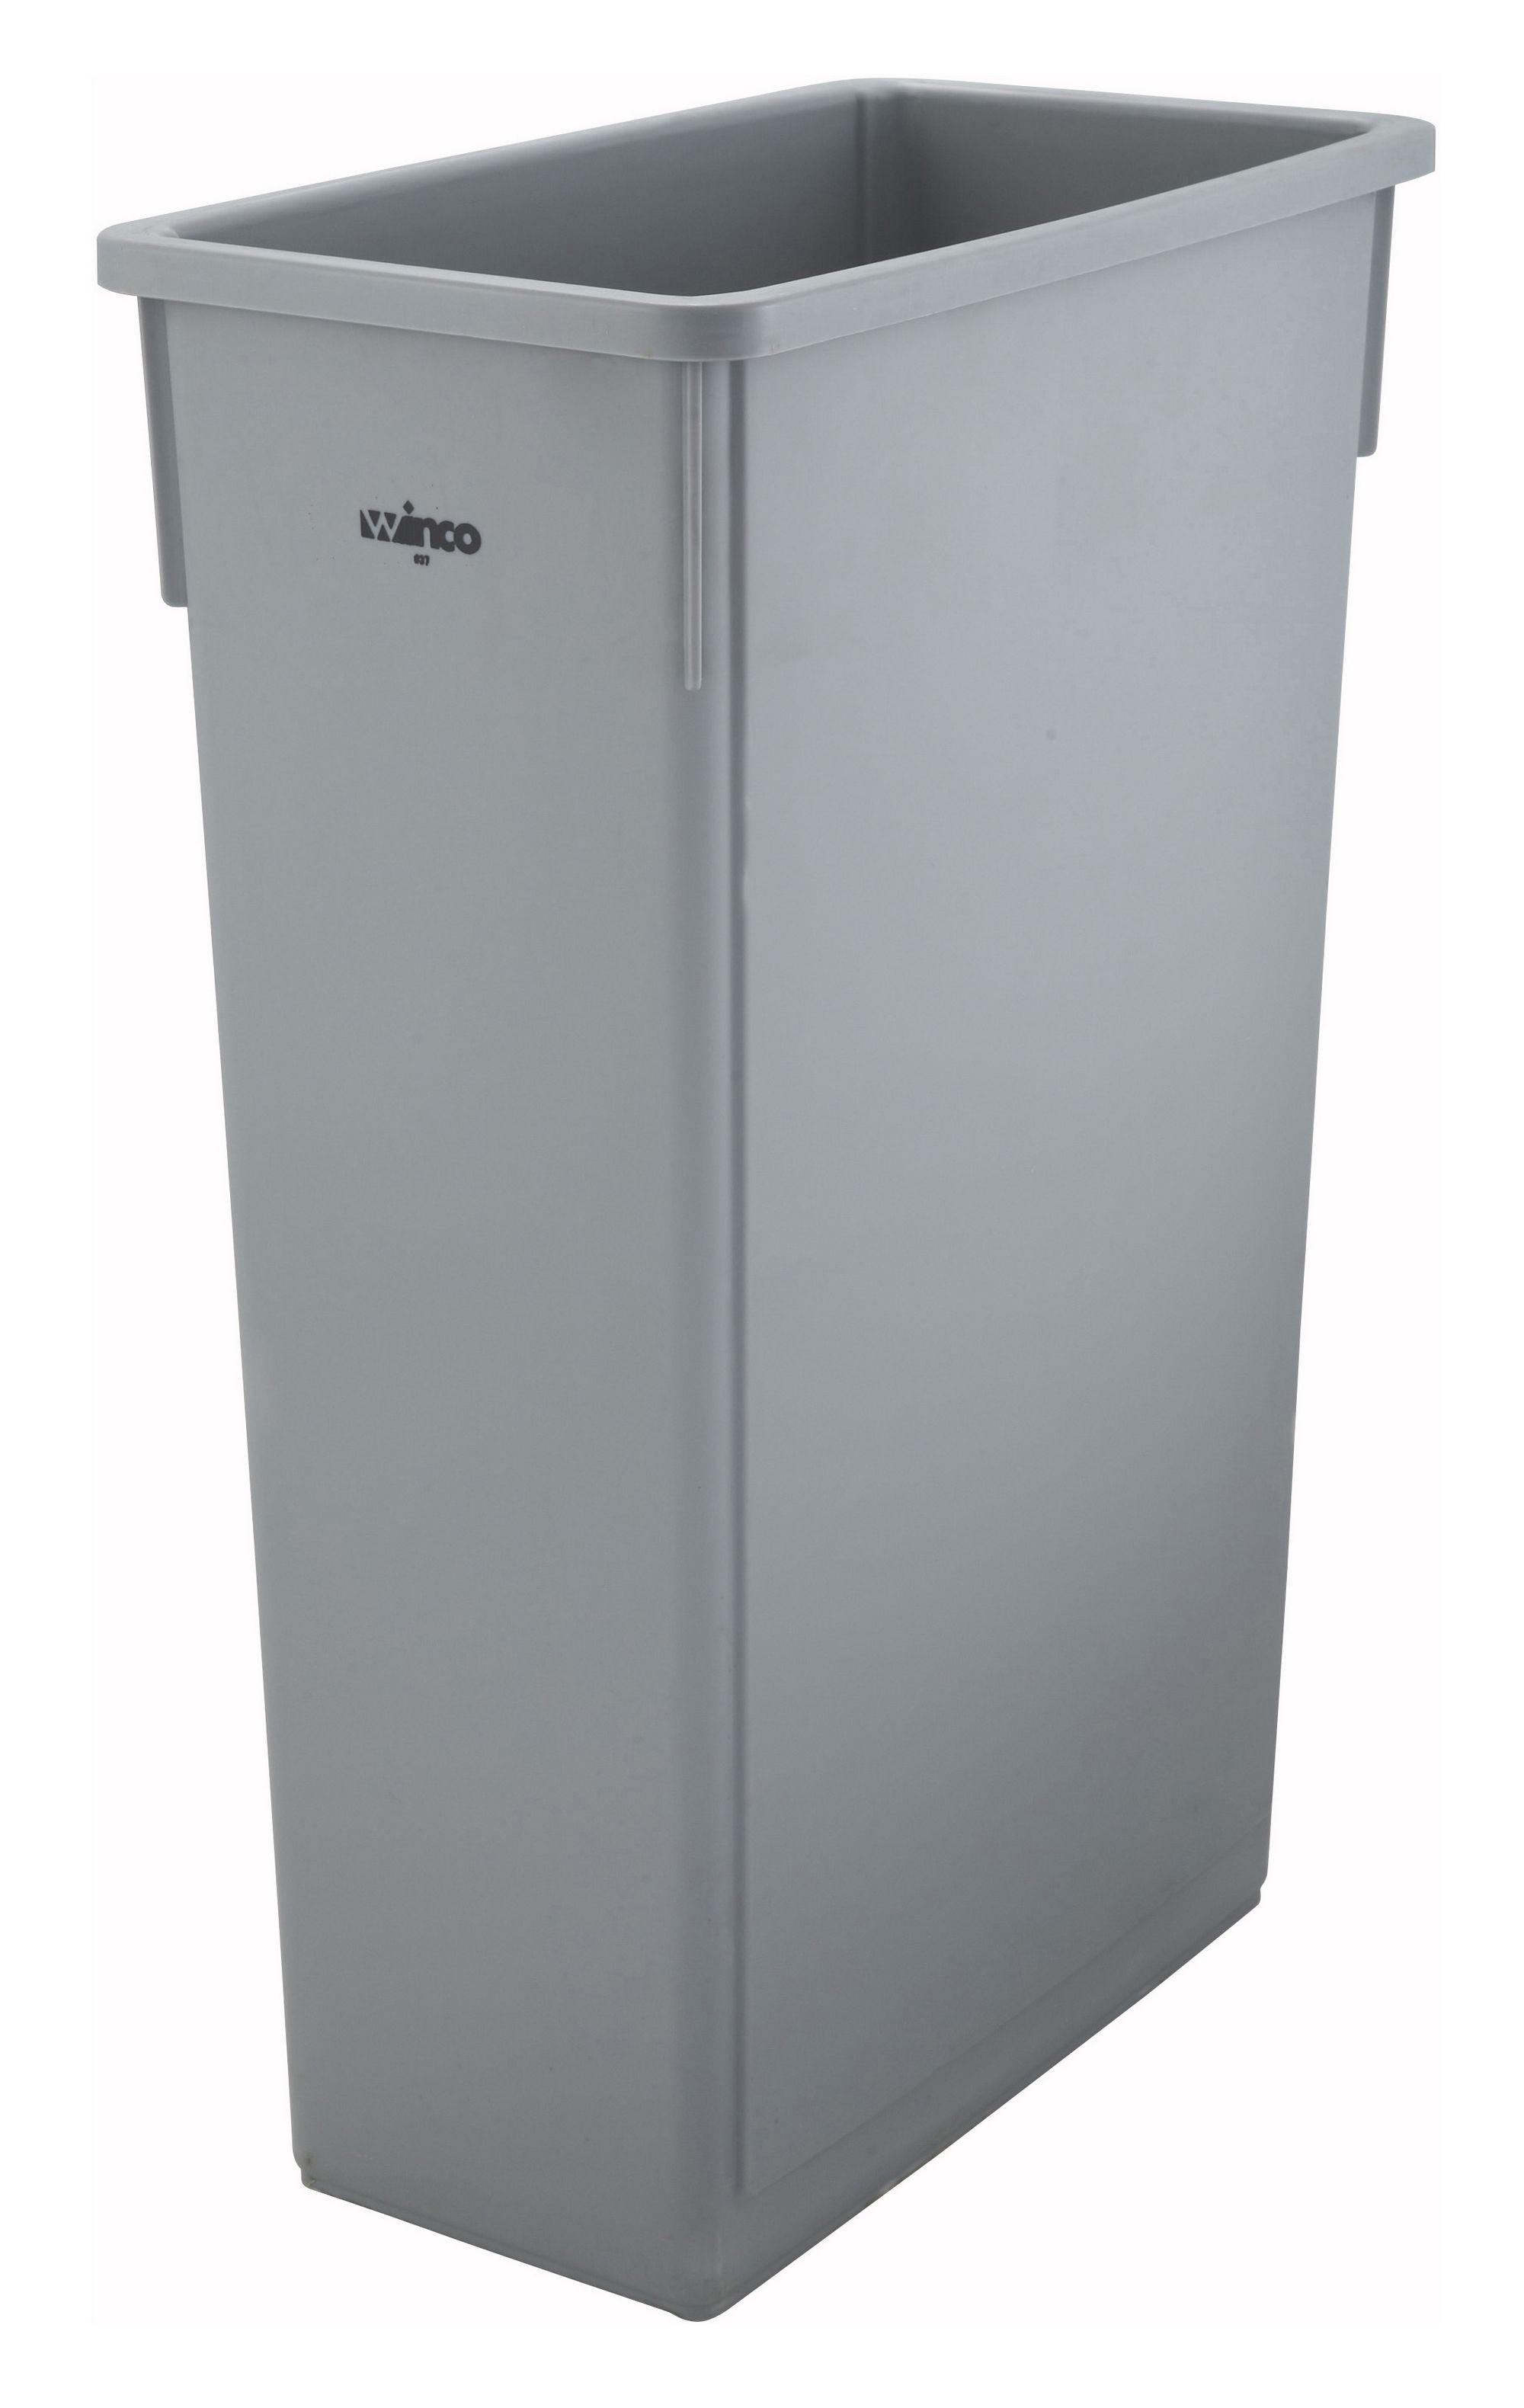 Winco PTC-23SG Grey 23 Gallon Slender Trash Can